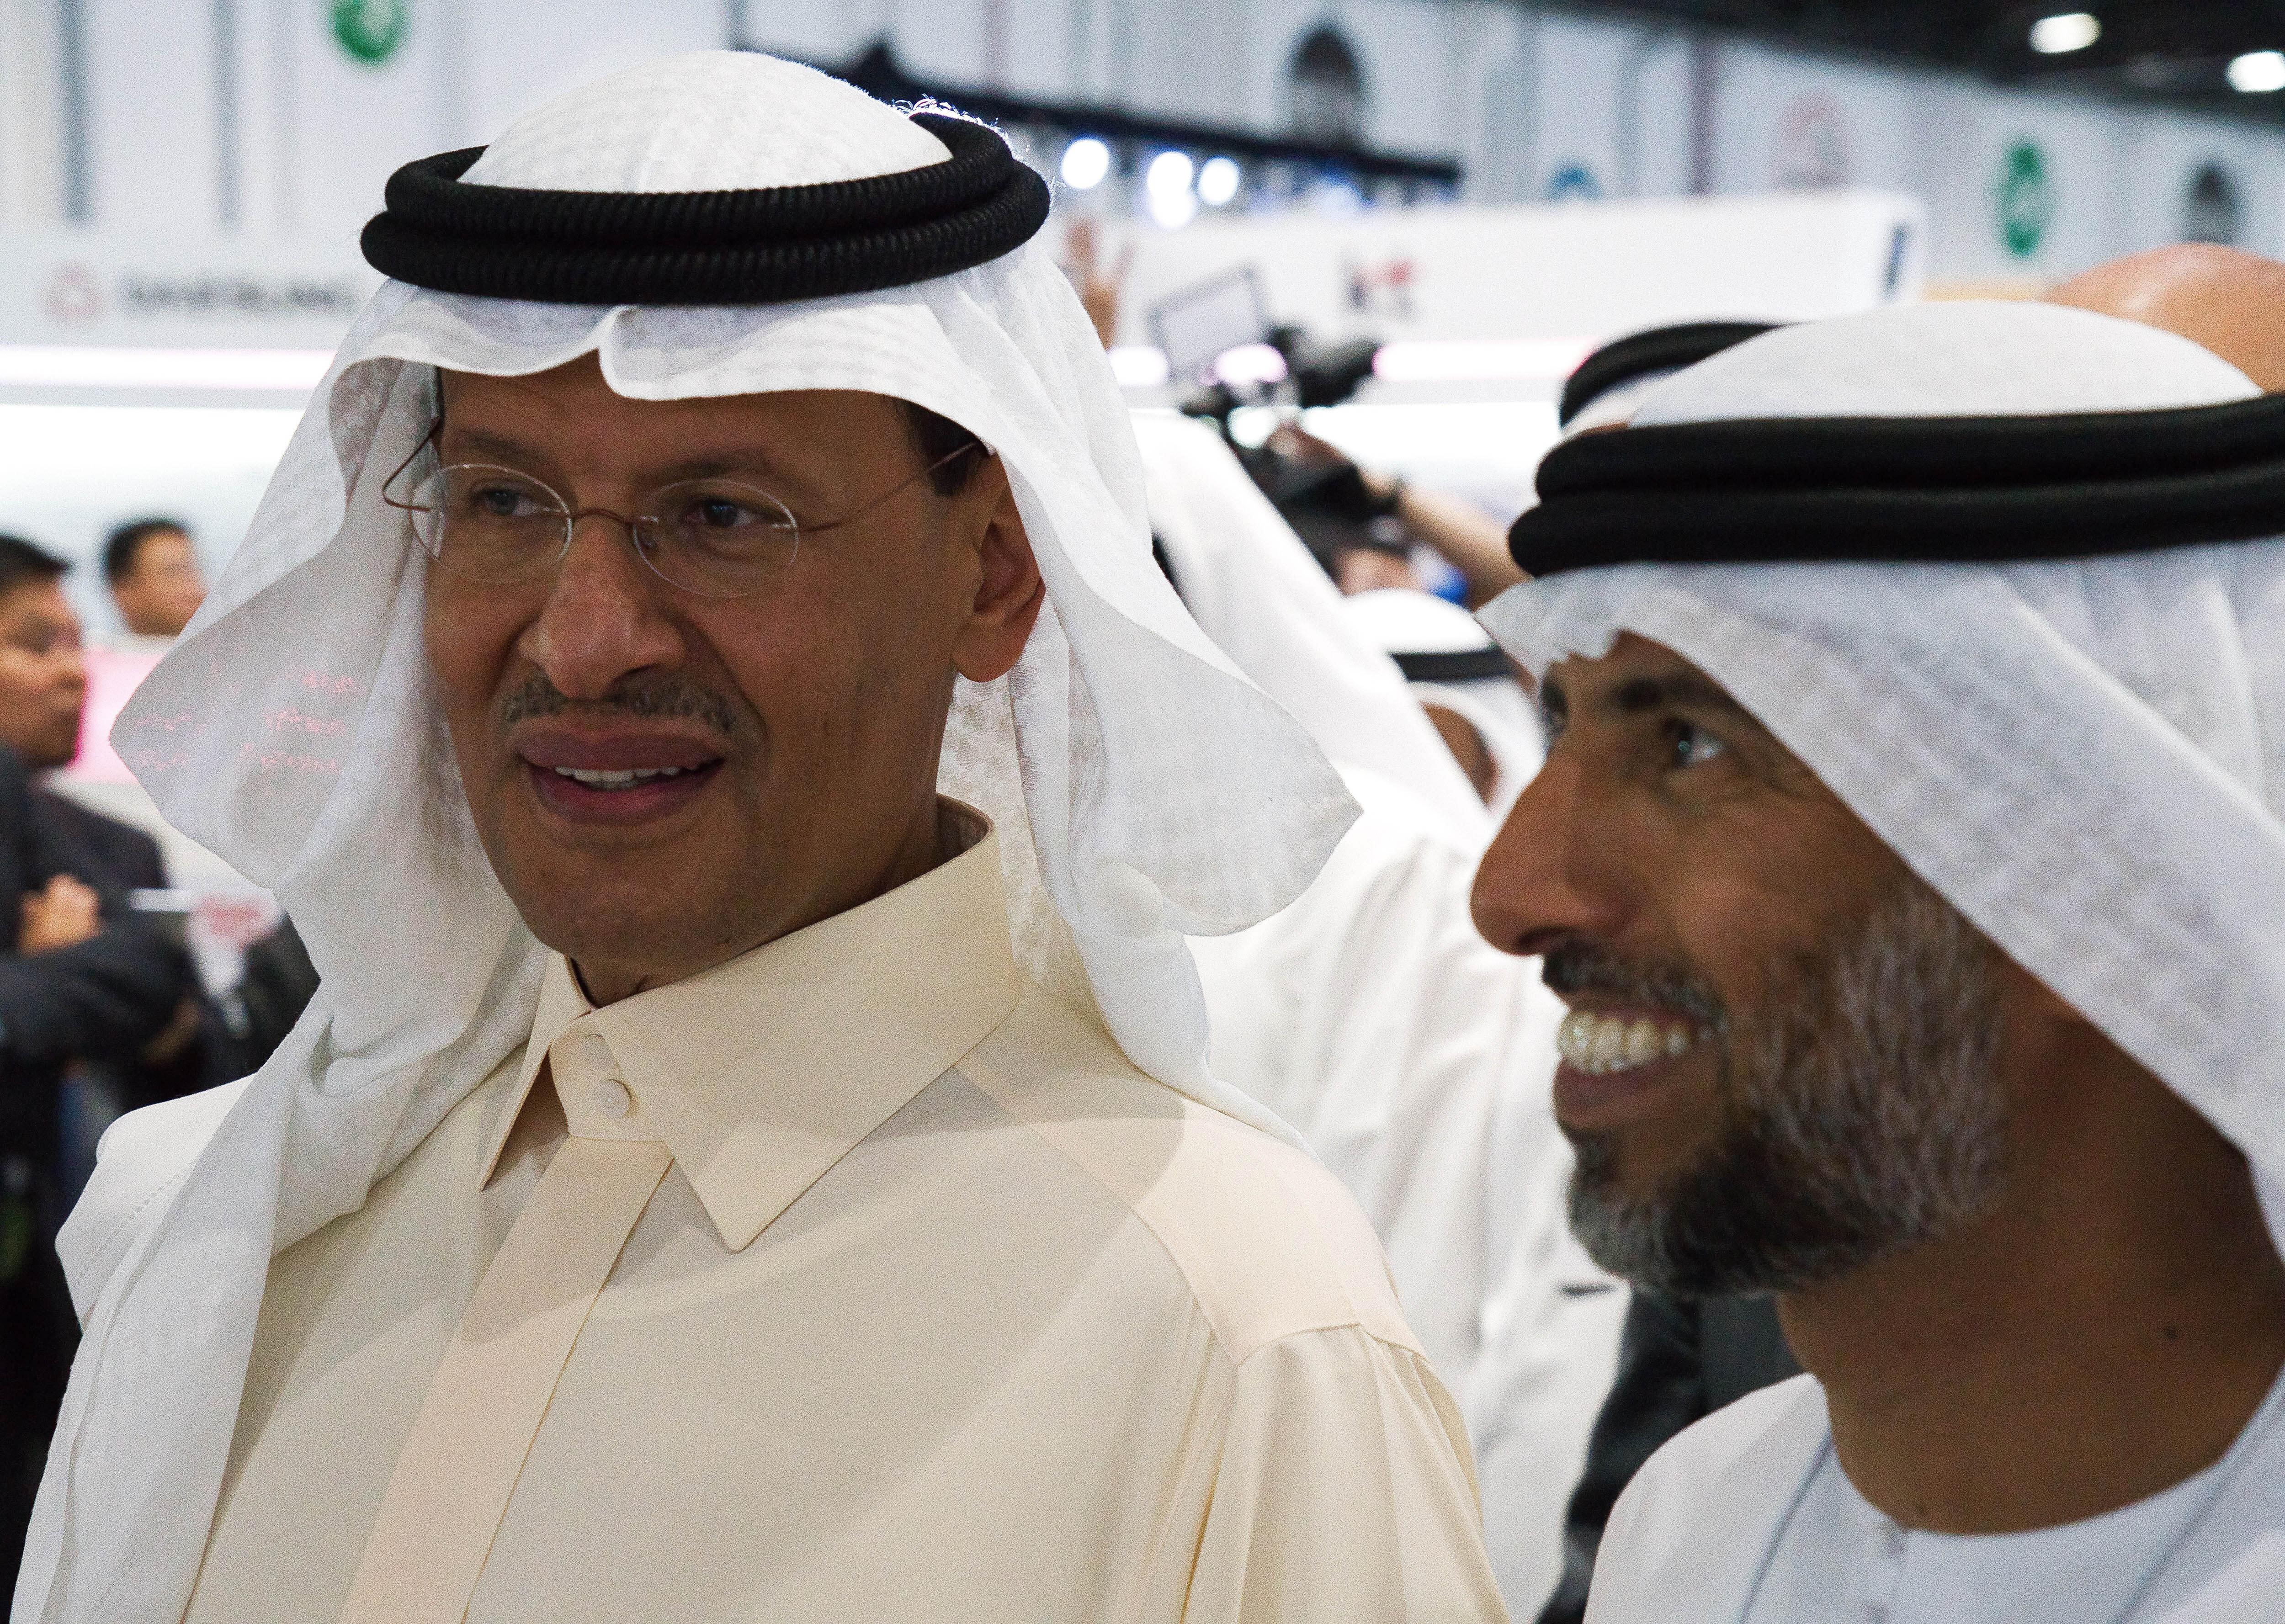 Saudi Arabia's new Energy Minister Prince Abdulaziz bin Salman, left, and United Arab Emirates Energy Minister Suhail al-Mazrouei, right, walk through an energy exhibition in Abu Dhabi, United Arab Emirates, Monday, Sept. 9, 2019. Prince Abdulaziz, as well as the CEOs of Total SA and ENI SpA, were in Abu Dhabi on Monday at the World Energy Congress. (AP Photo/Jon Gambrell)